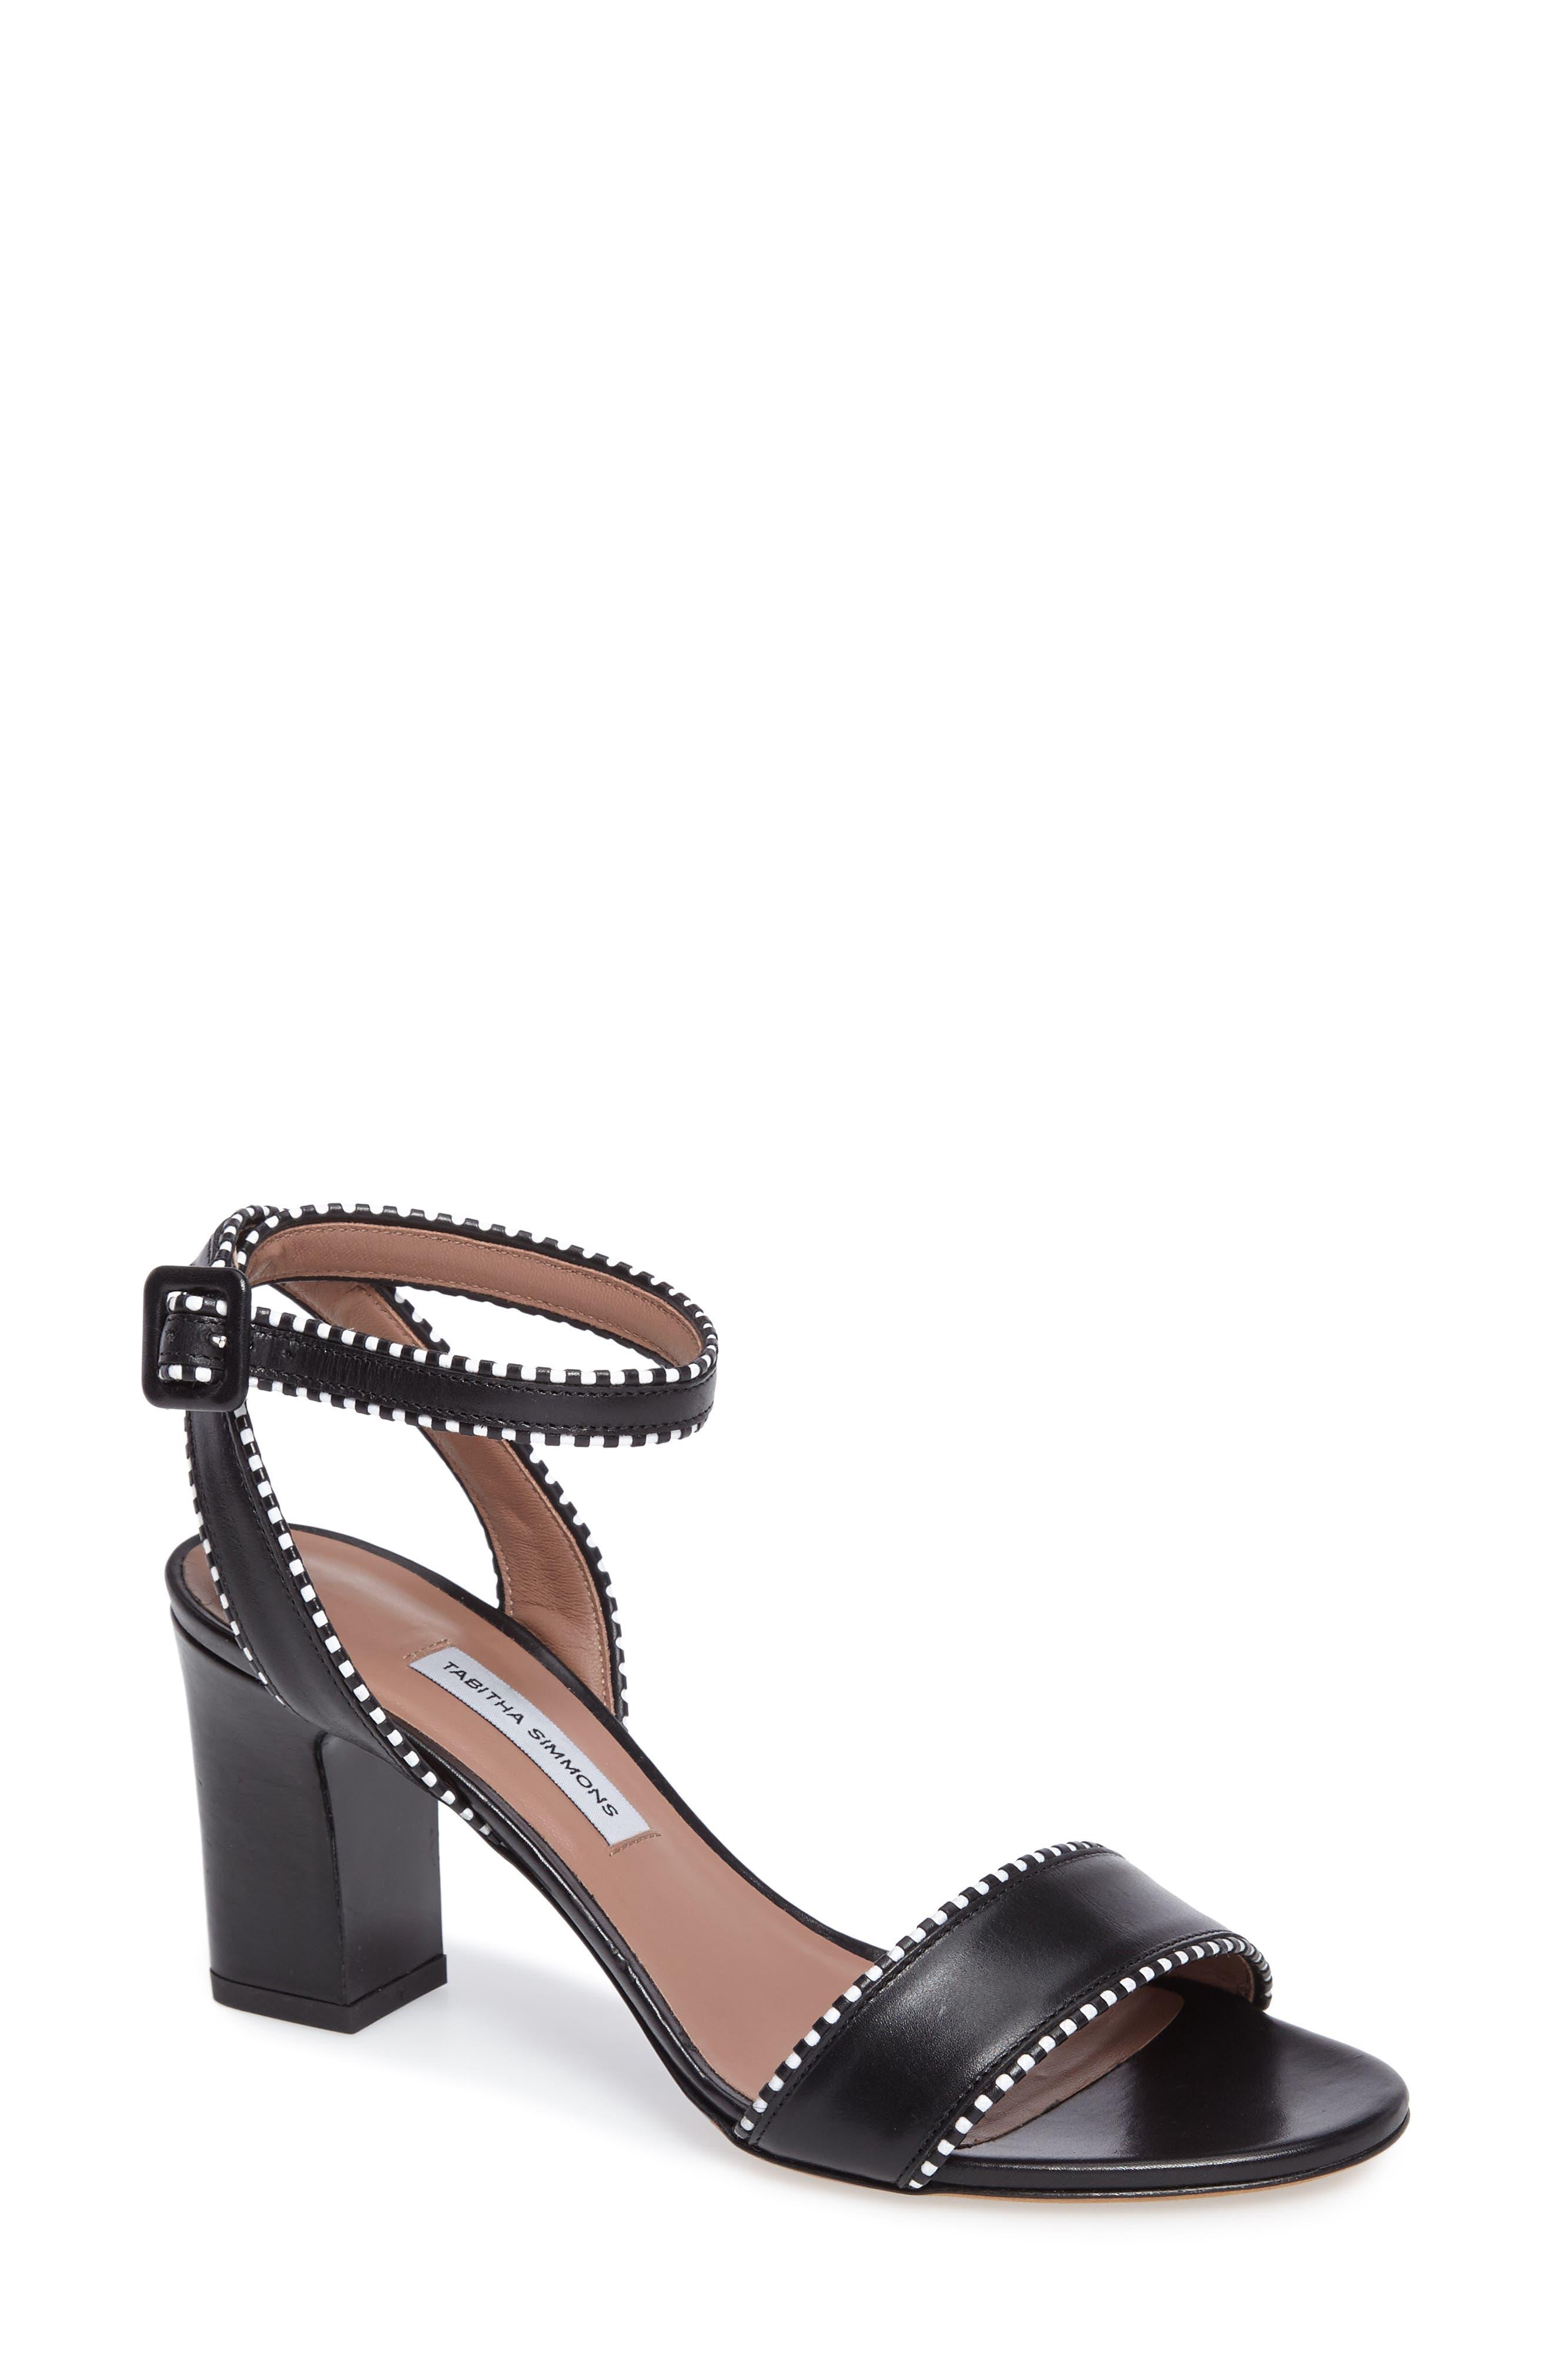 Leticia Profilo Ankle Strap Sandal,                             Main thumbnail 1, color,                             Black